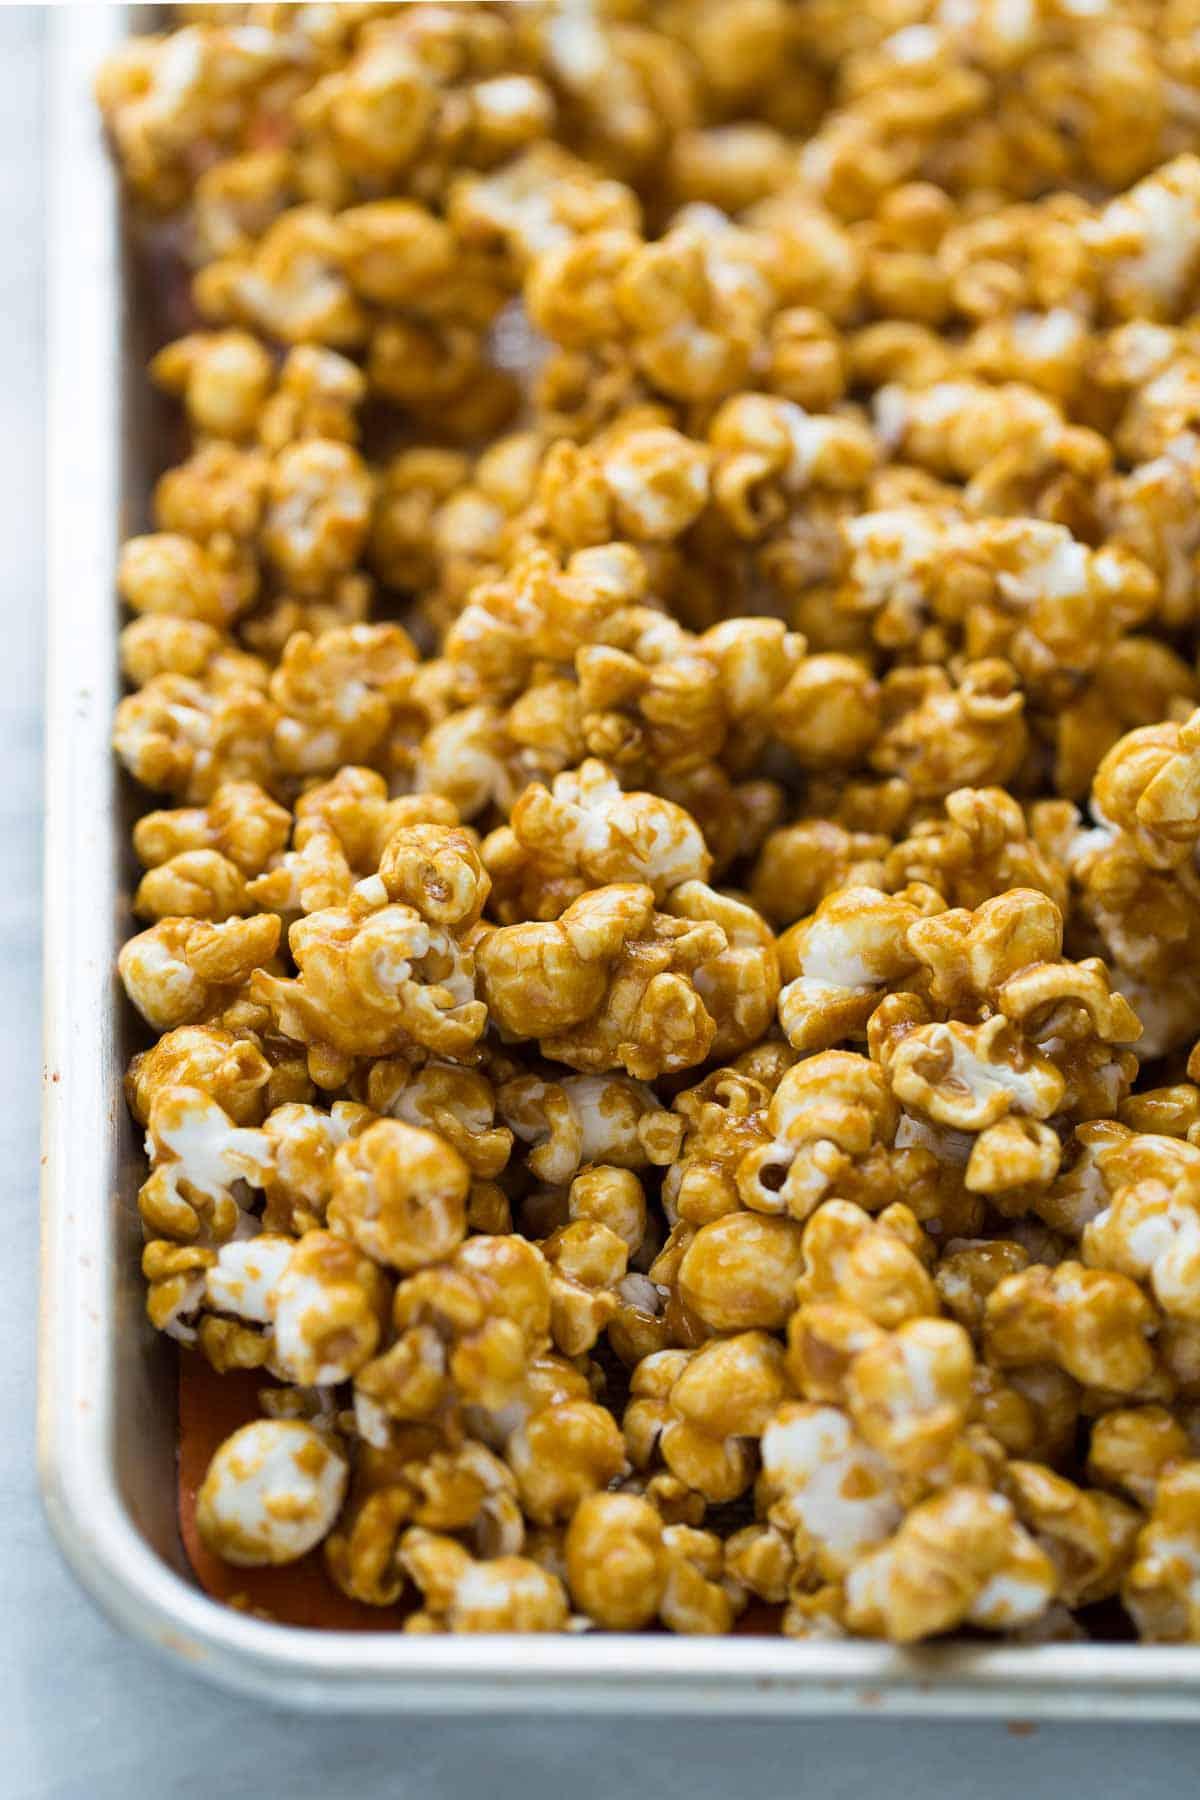 caramel corn on baking sheet